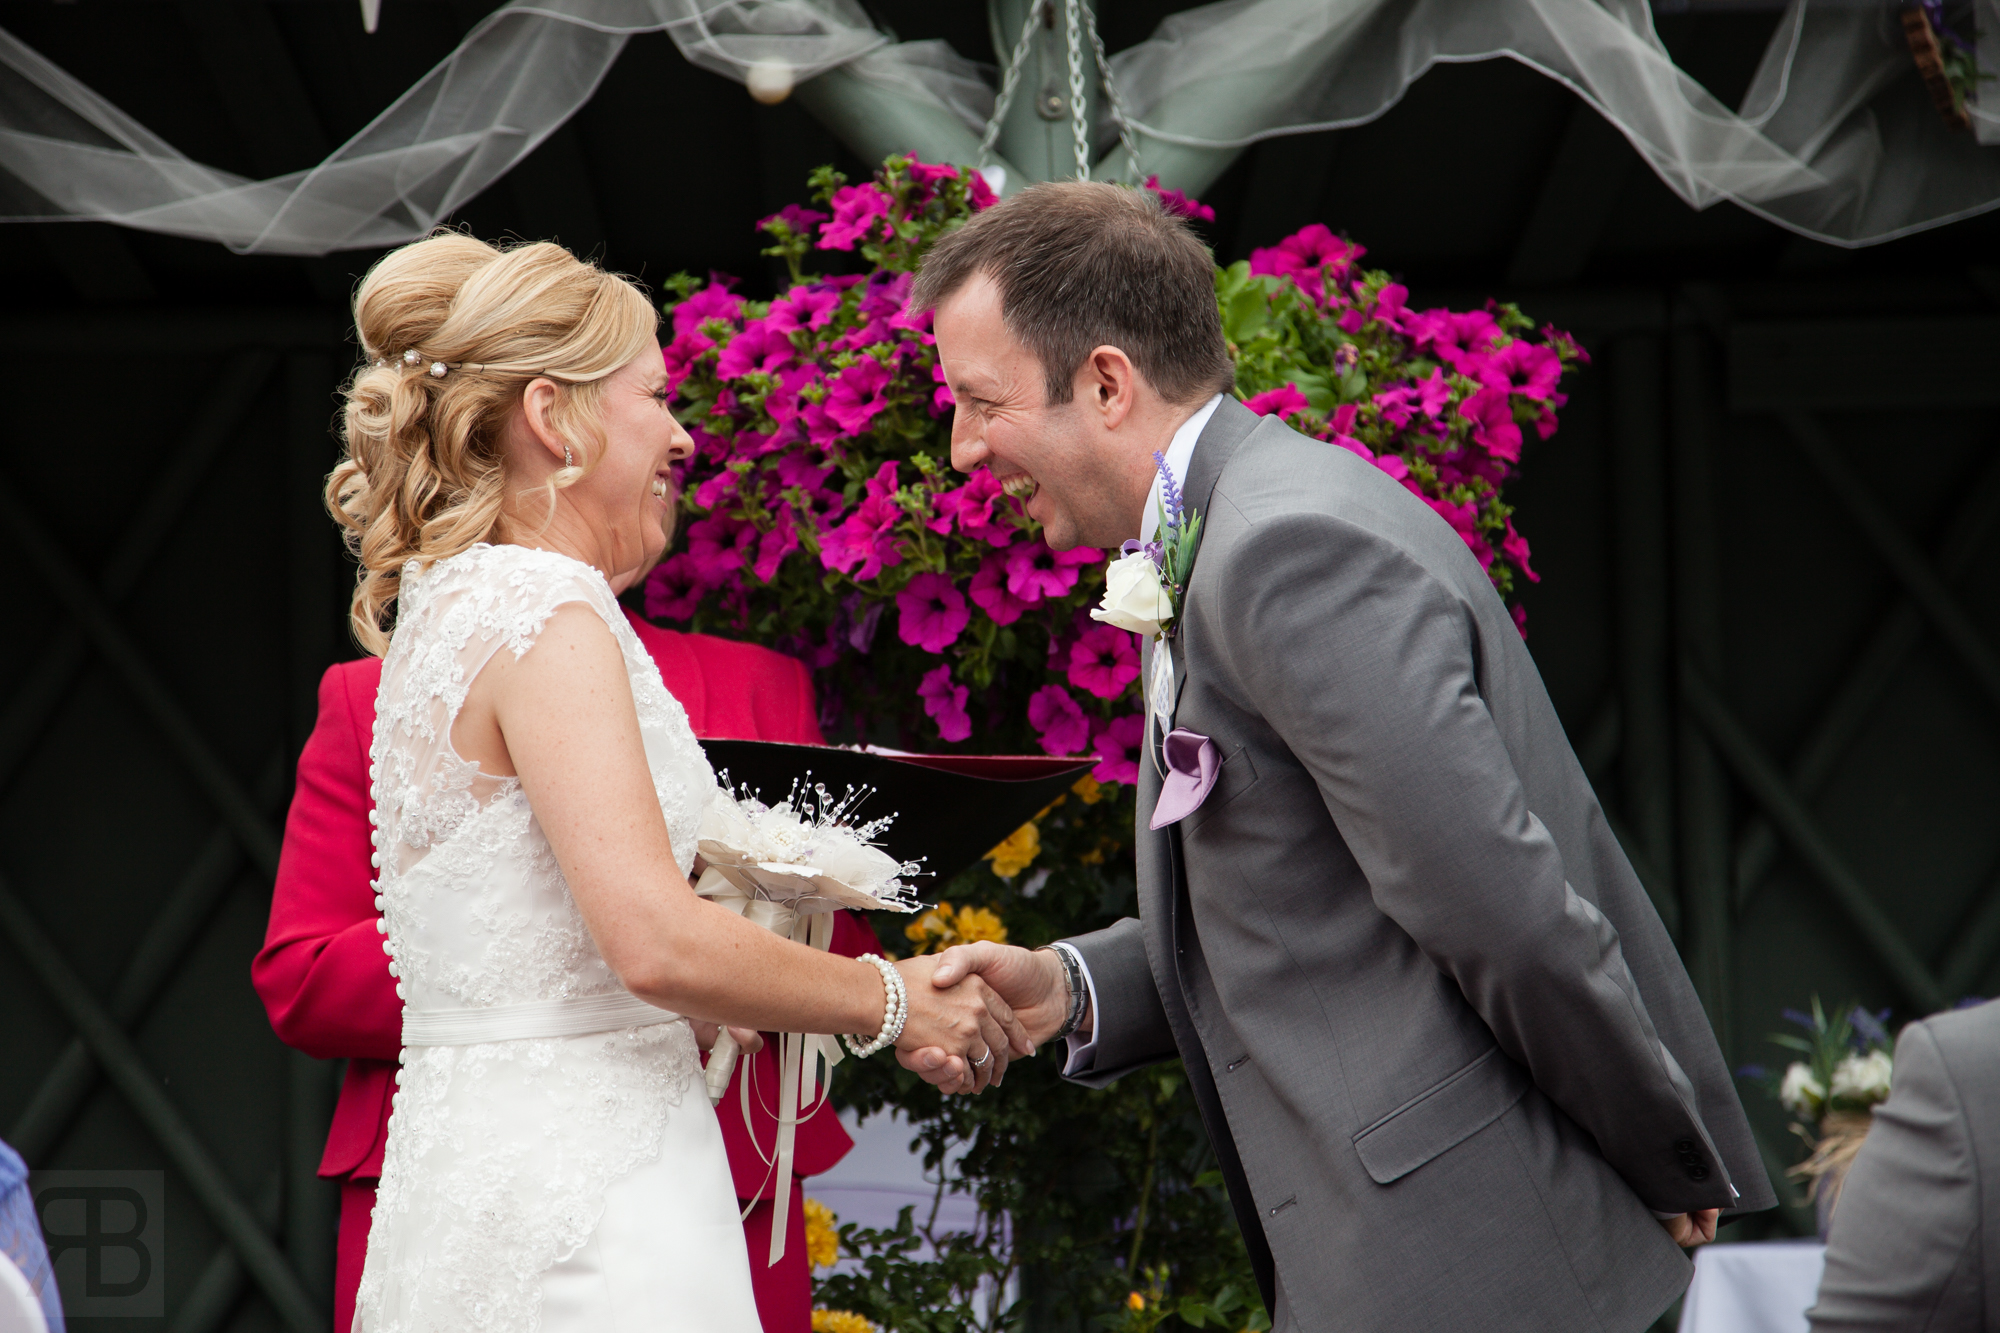 110715_LisaCraigJohnson_Wedding_5624216_WebWM.jpg